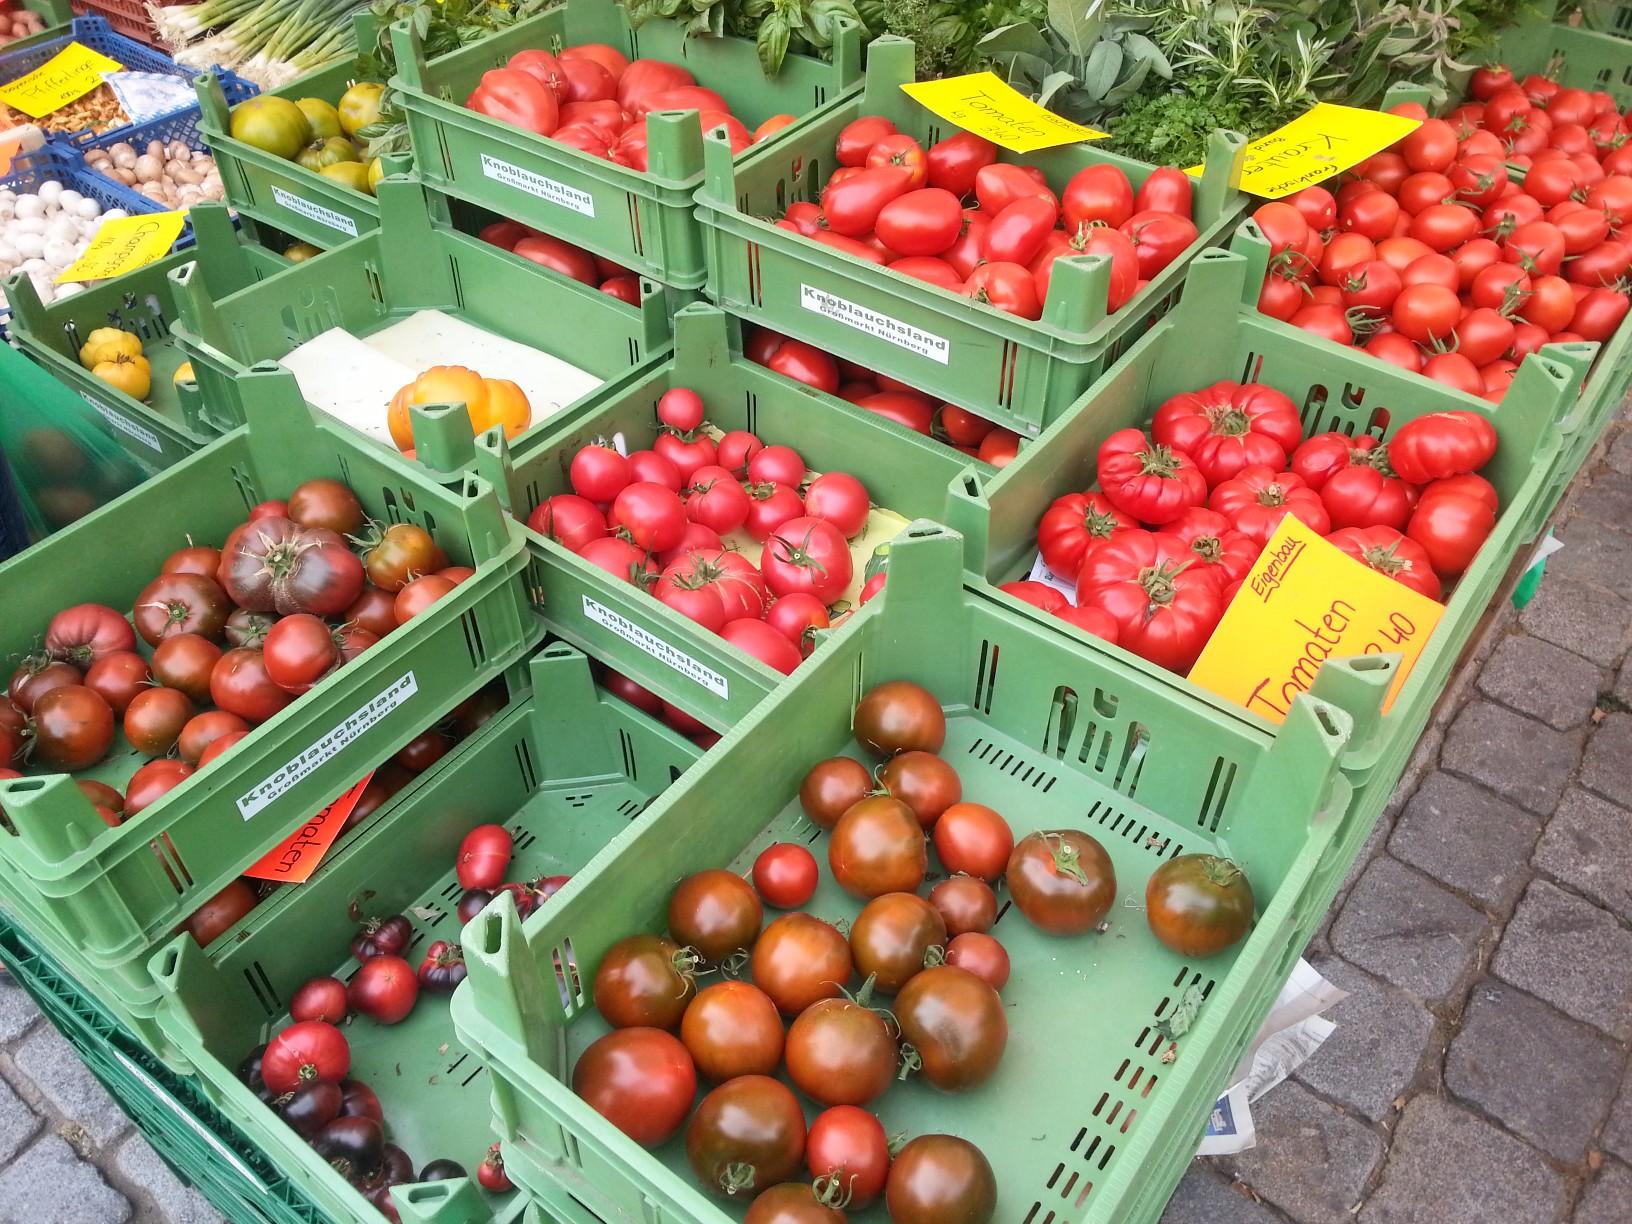 Erlanger Markt Tomatenspezialist